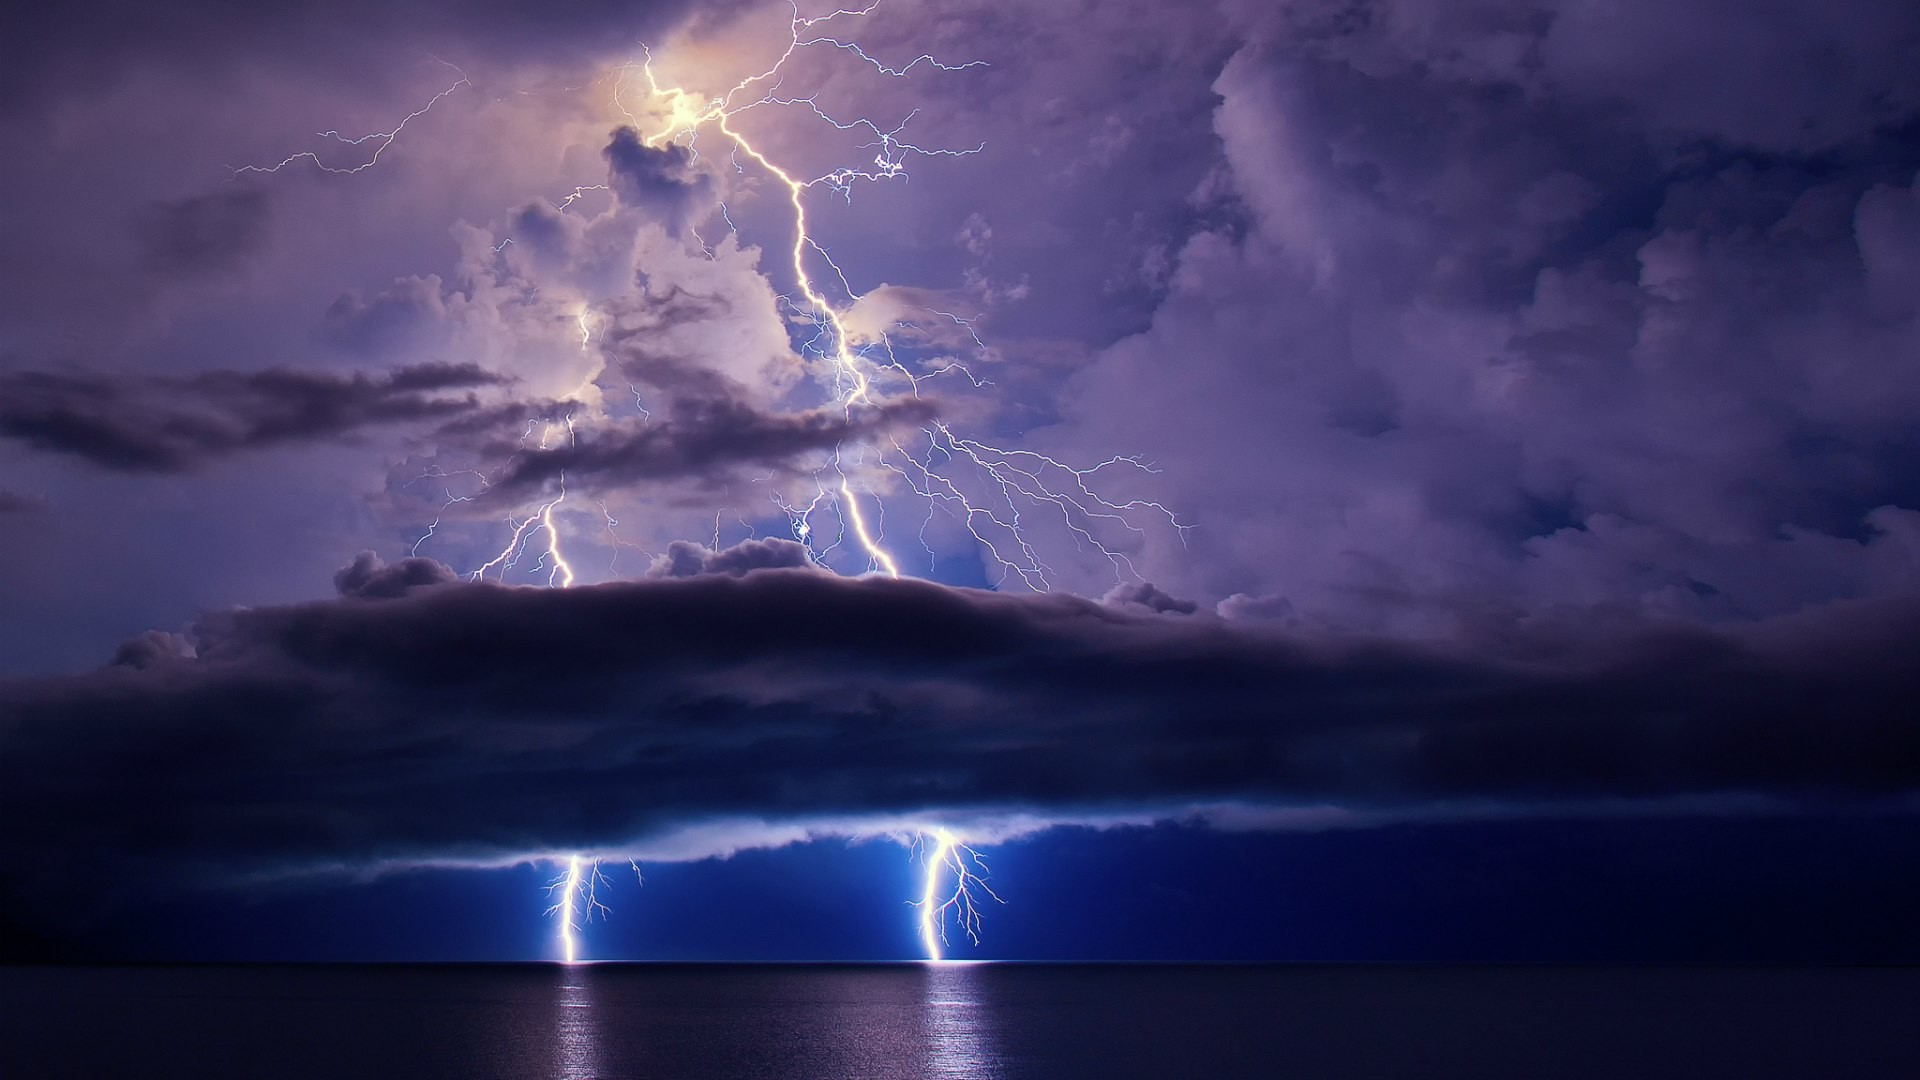 Storm Clouds Wallpaper 76 Images